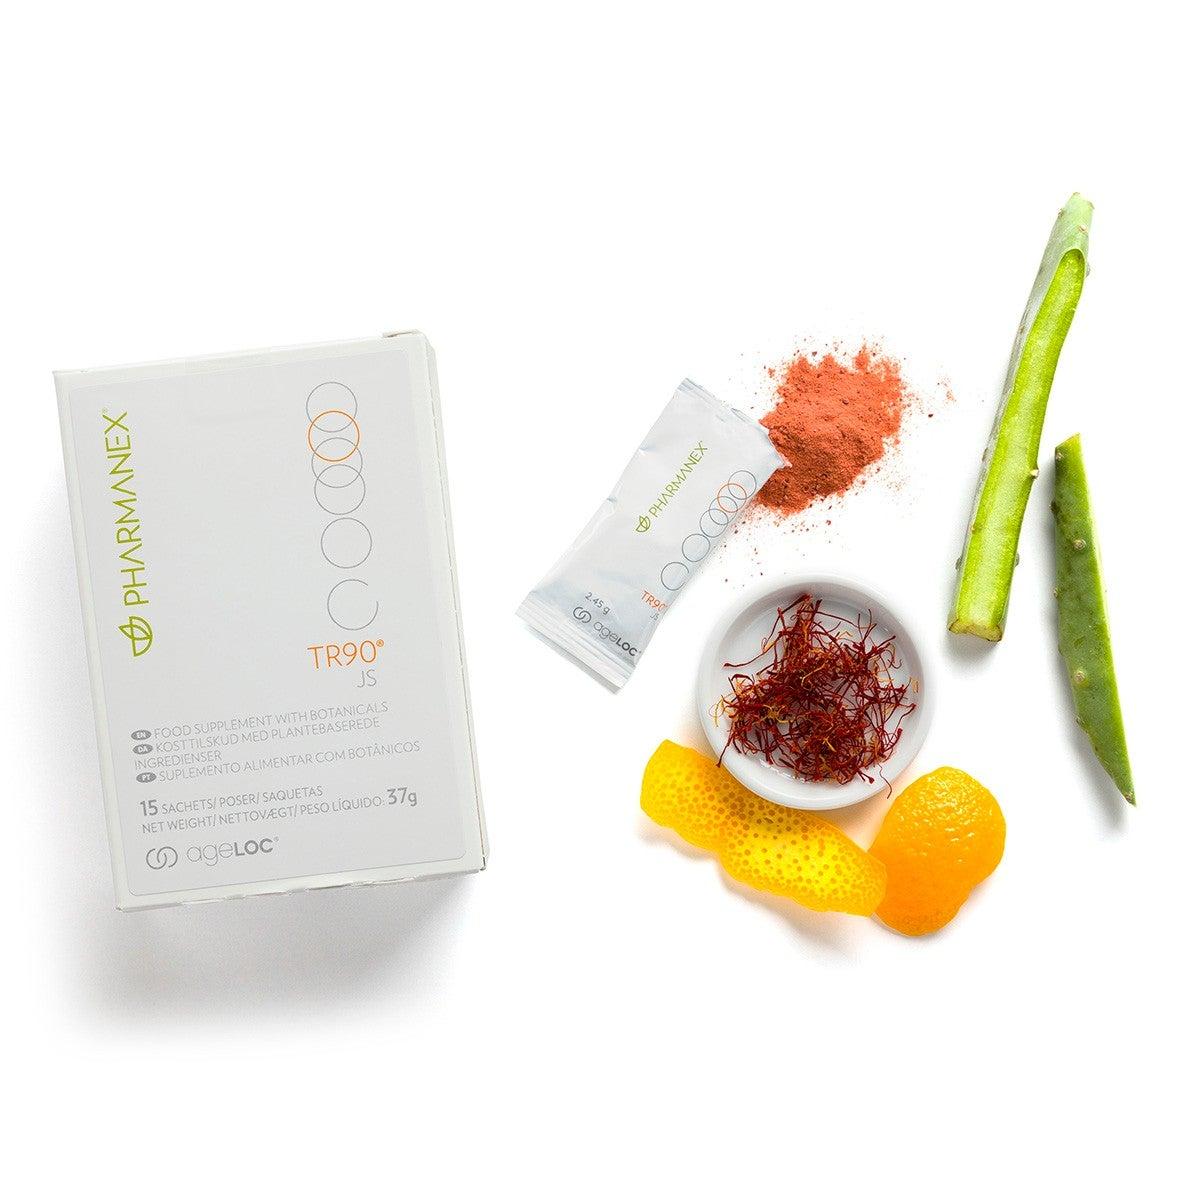 Pharmanex TR90 JS, botanical food supplement